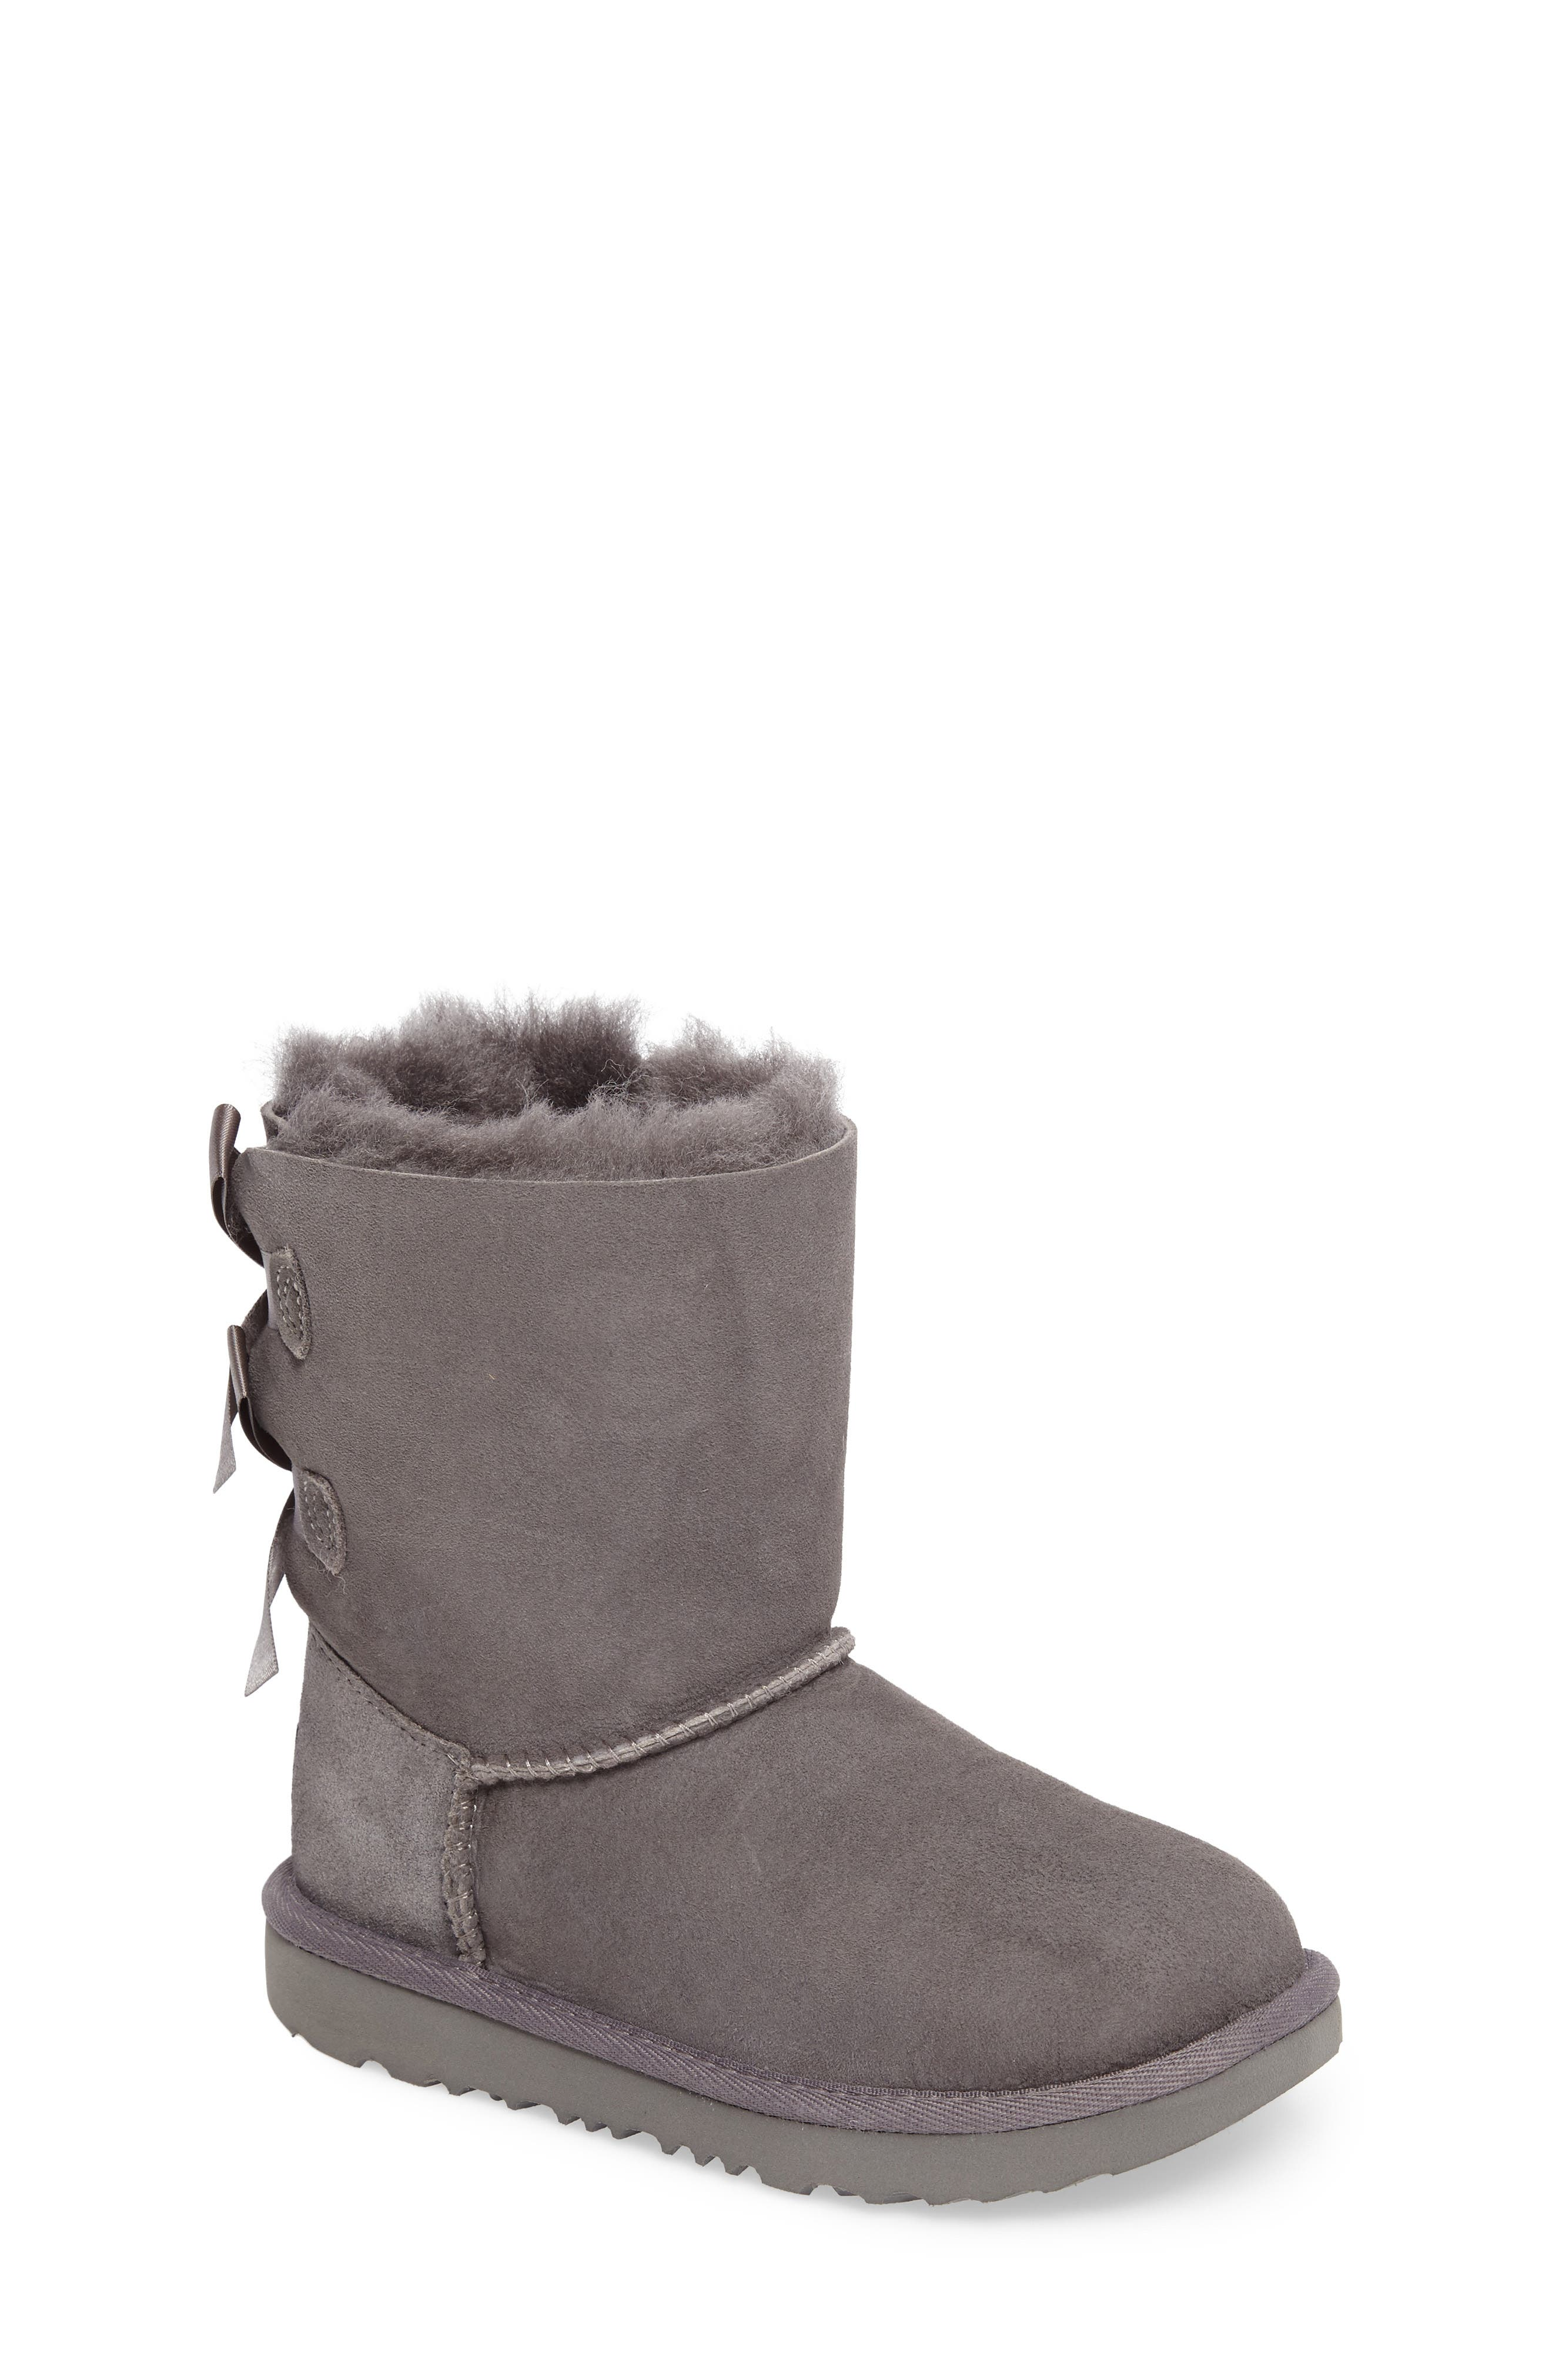 UGG® Bailey Bow II Water Resistant Genuine Shearling Boot (Walker, Toddler, Little Kid & Big Kid)